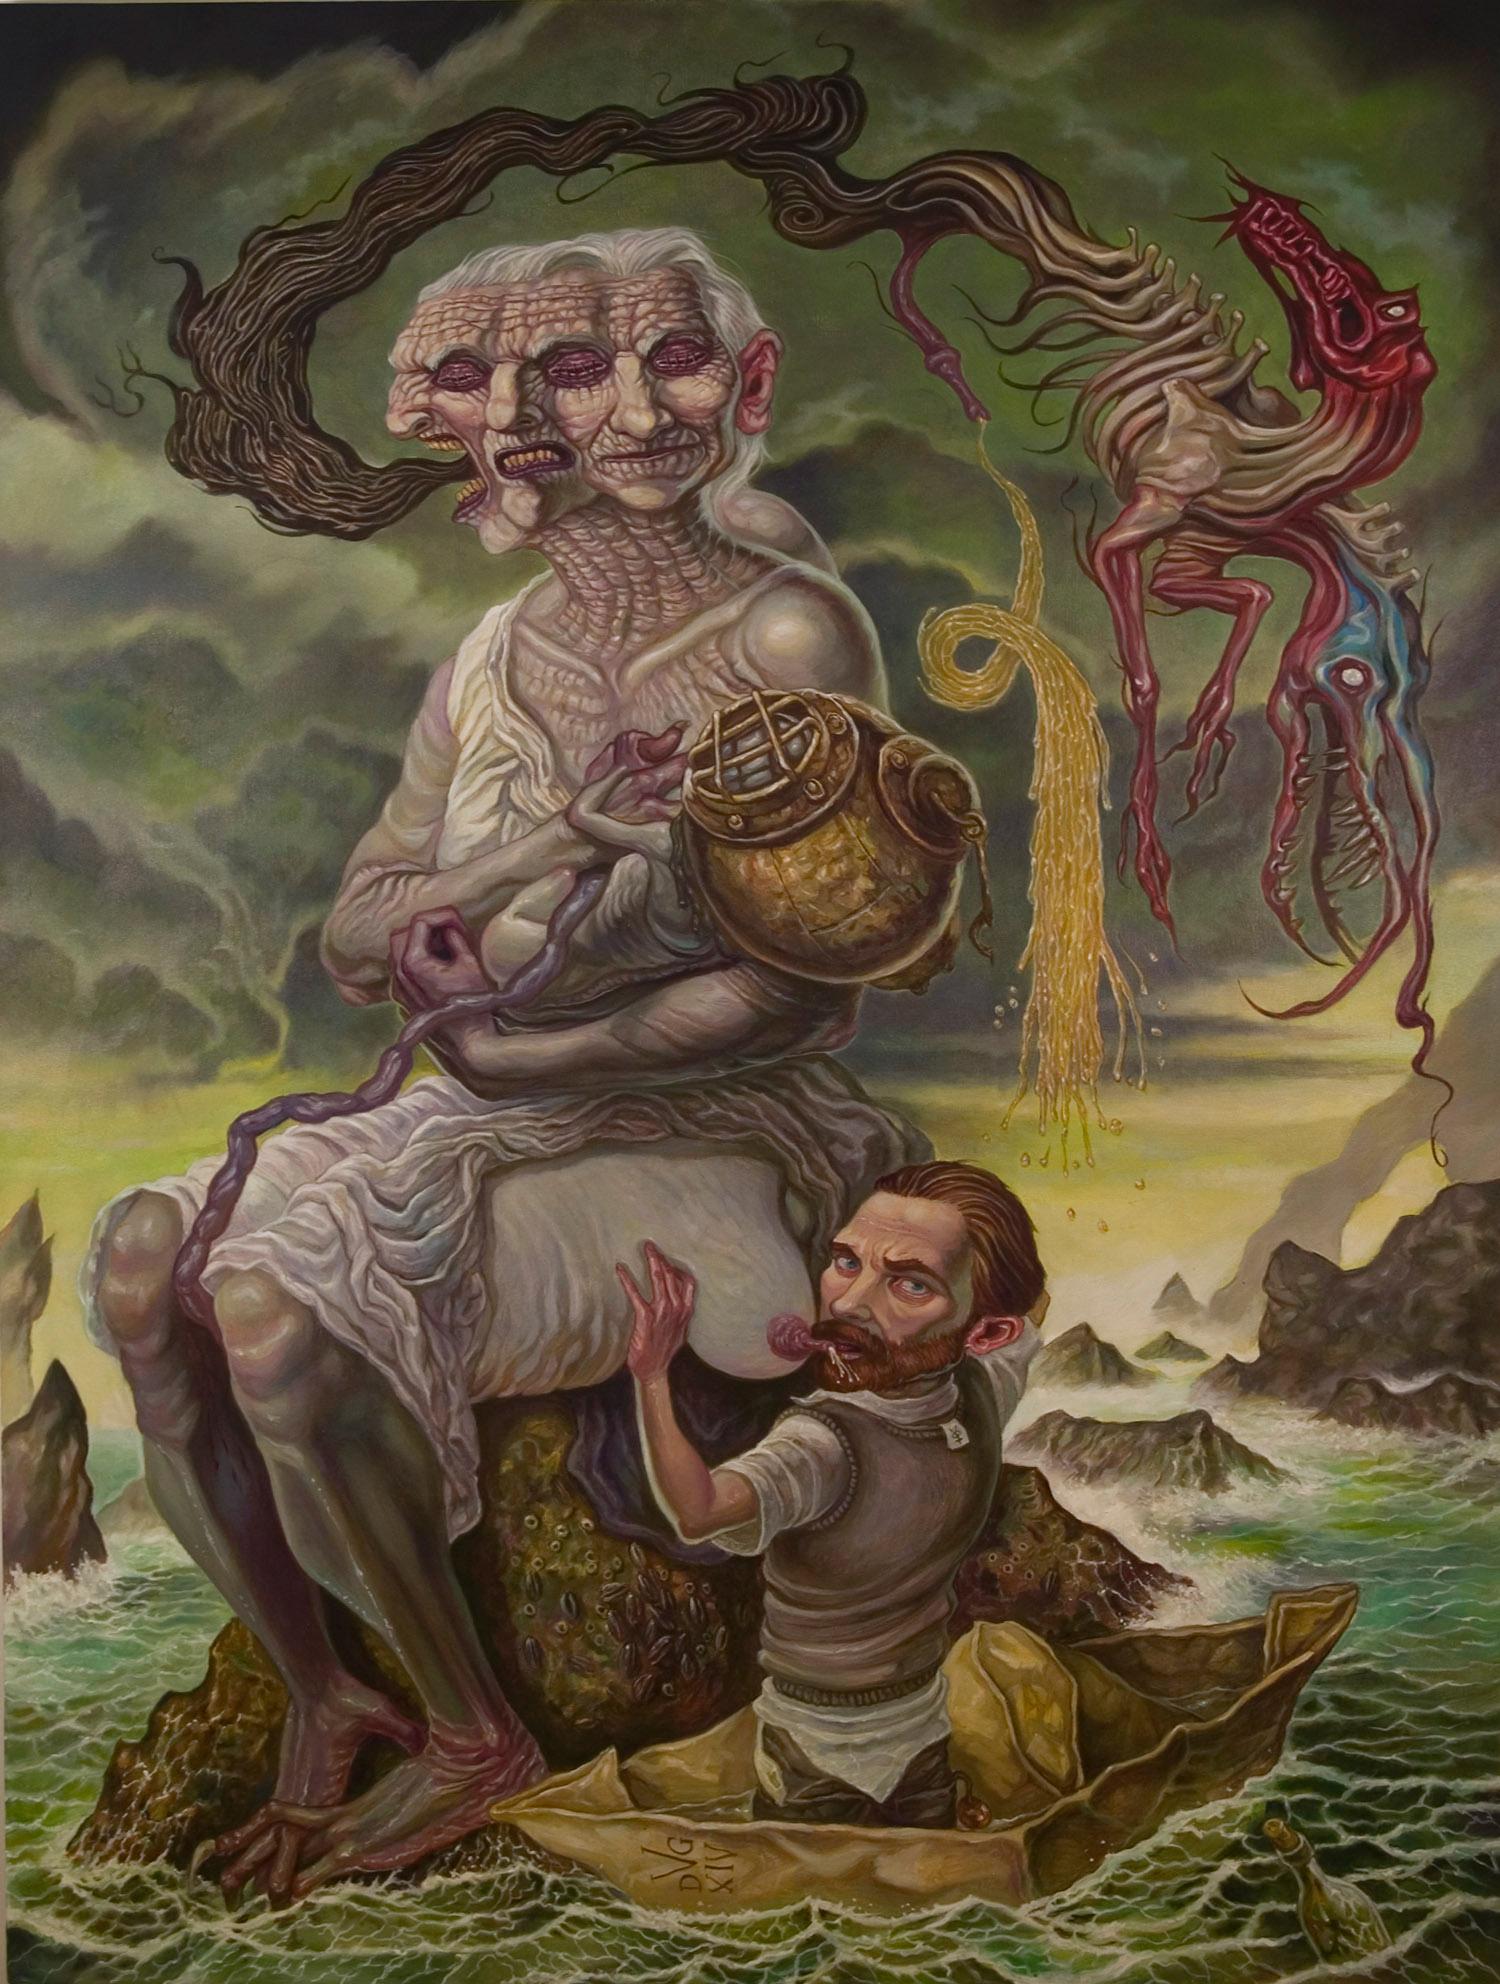 David Van Gough - A Thousand Furlongs of Sea for an Acre of Barren Land